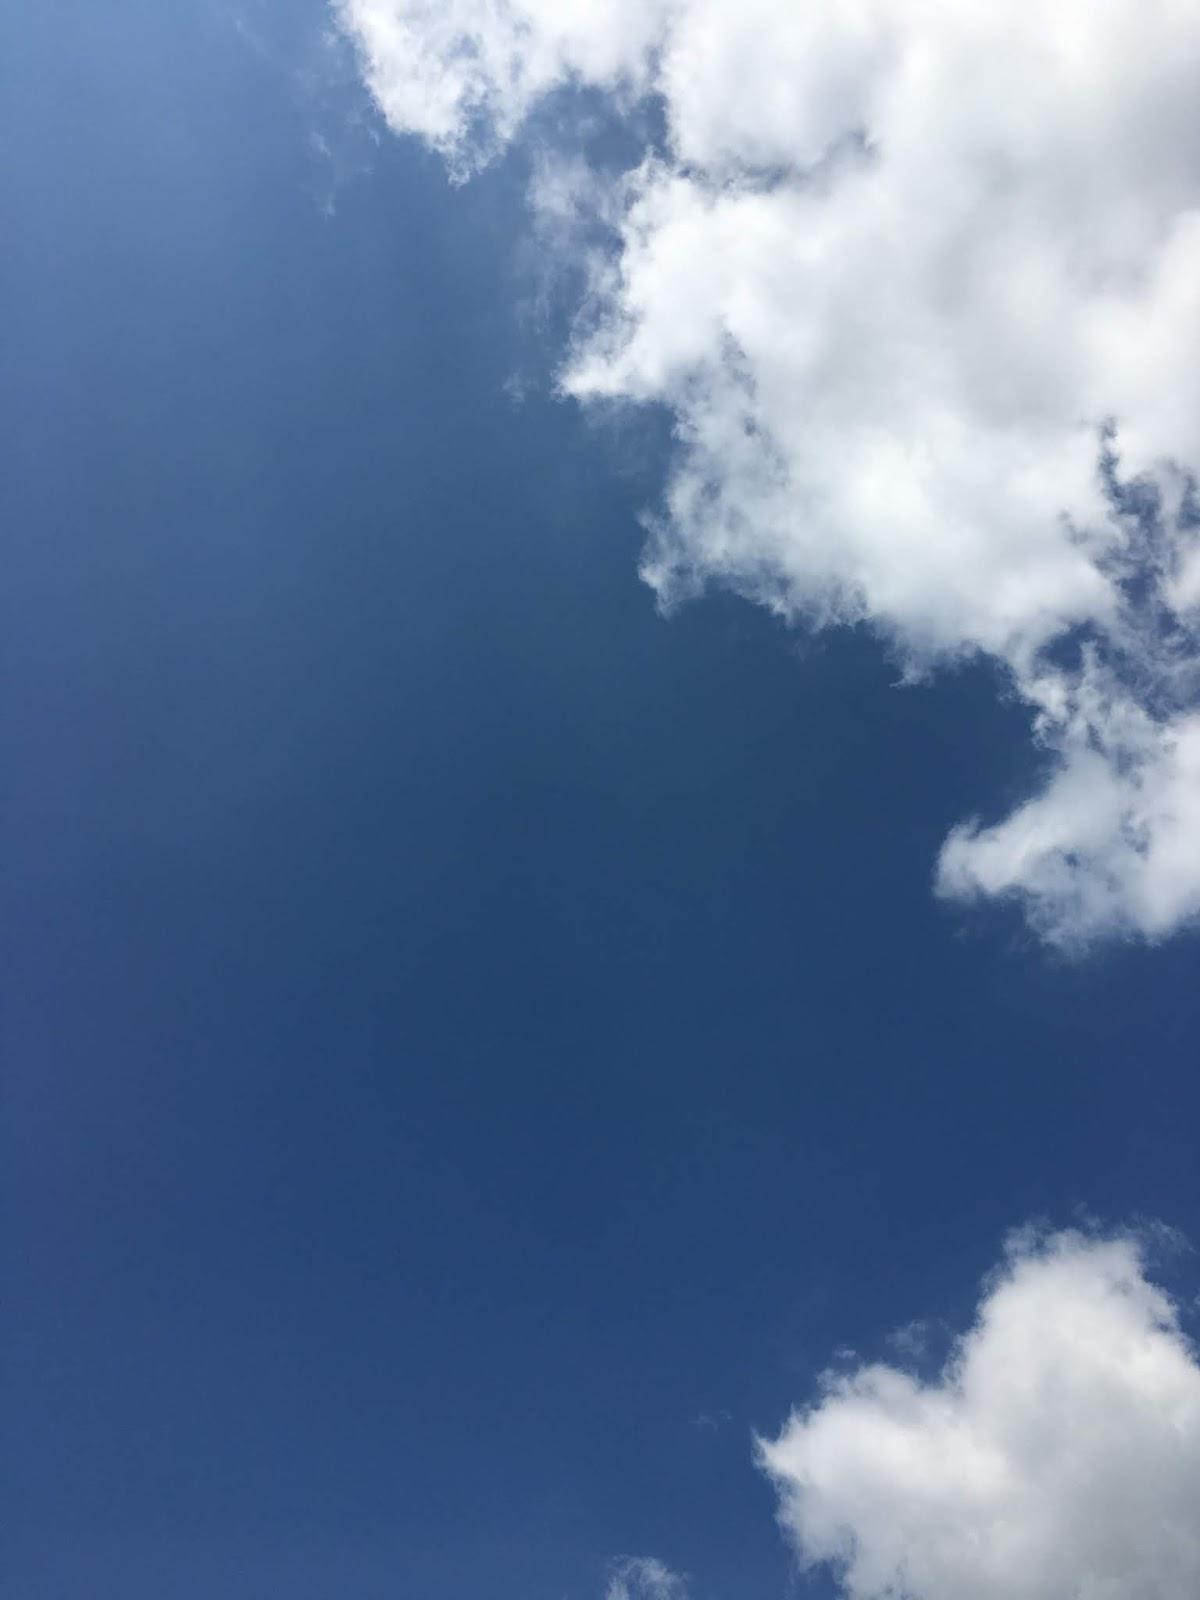 summer hot day